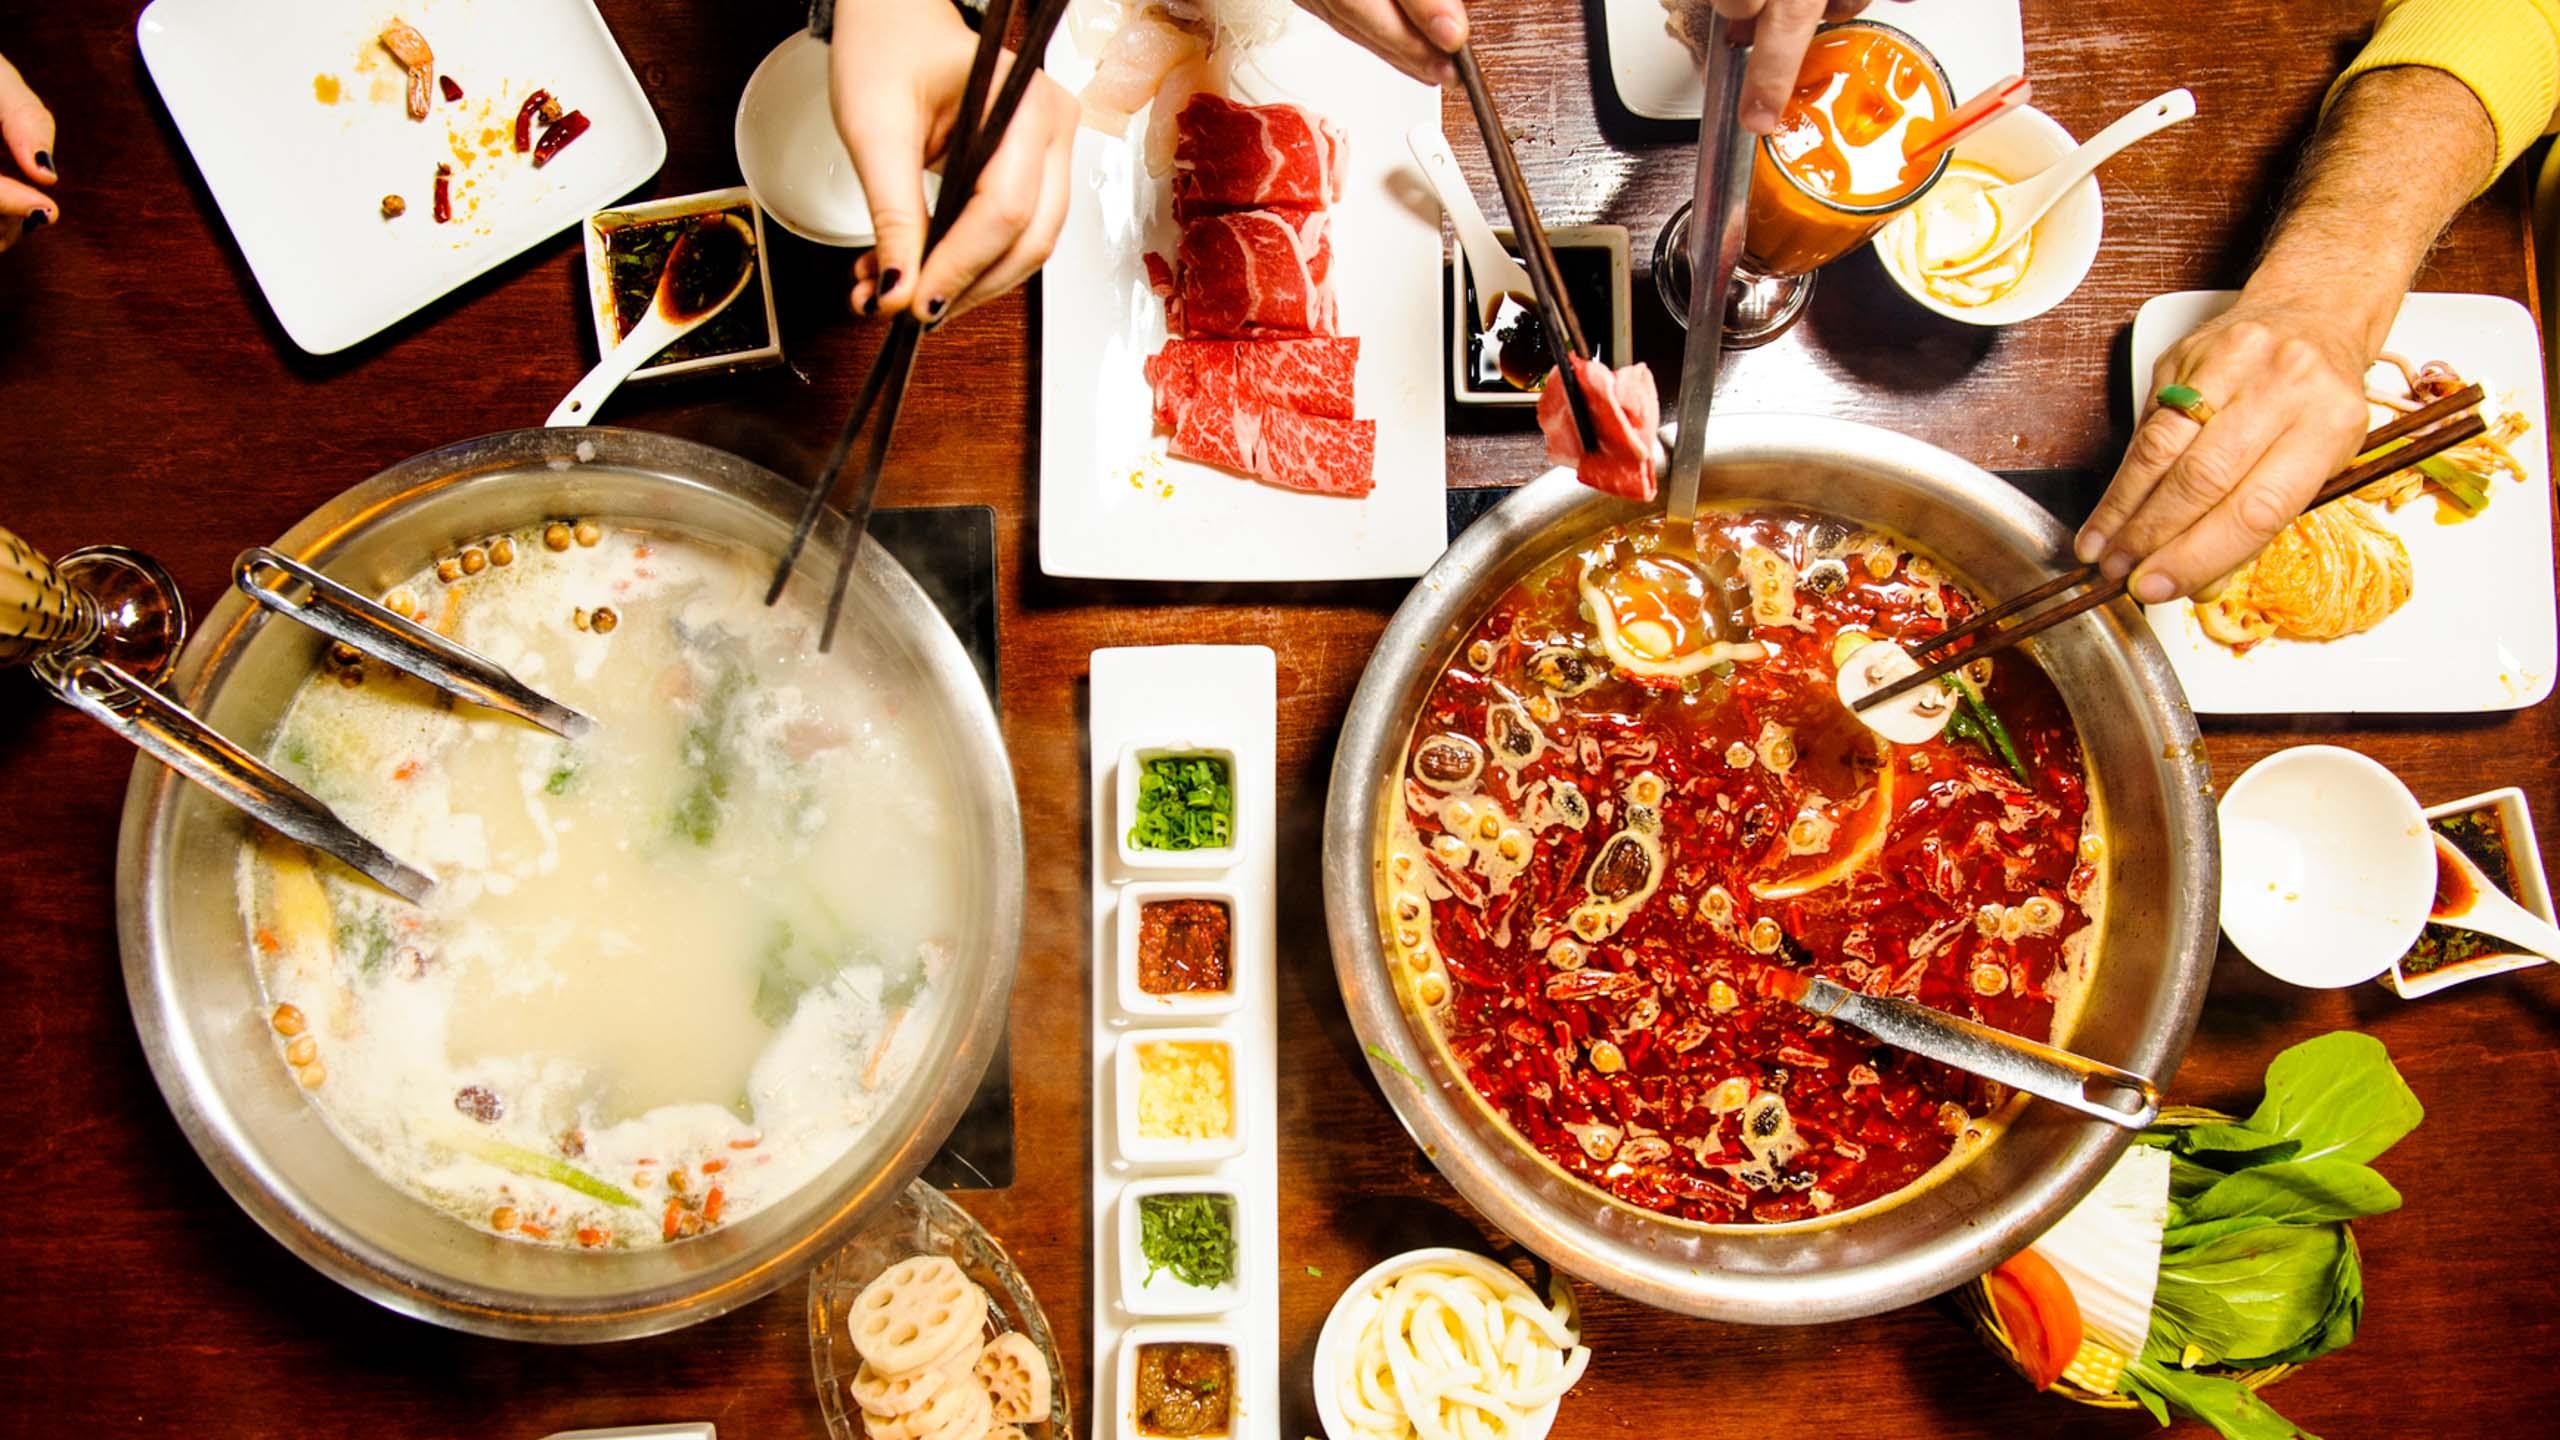 Meet San Francisco's chefs and foodies - Wayne Pollock Exclusive Luxury